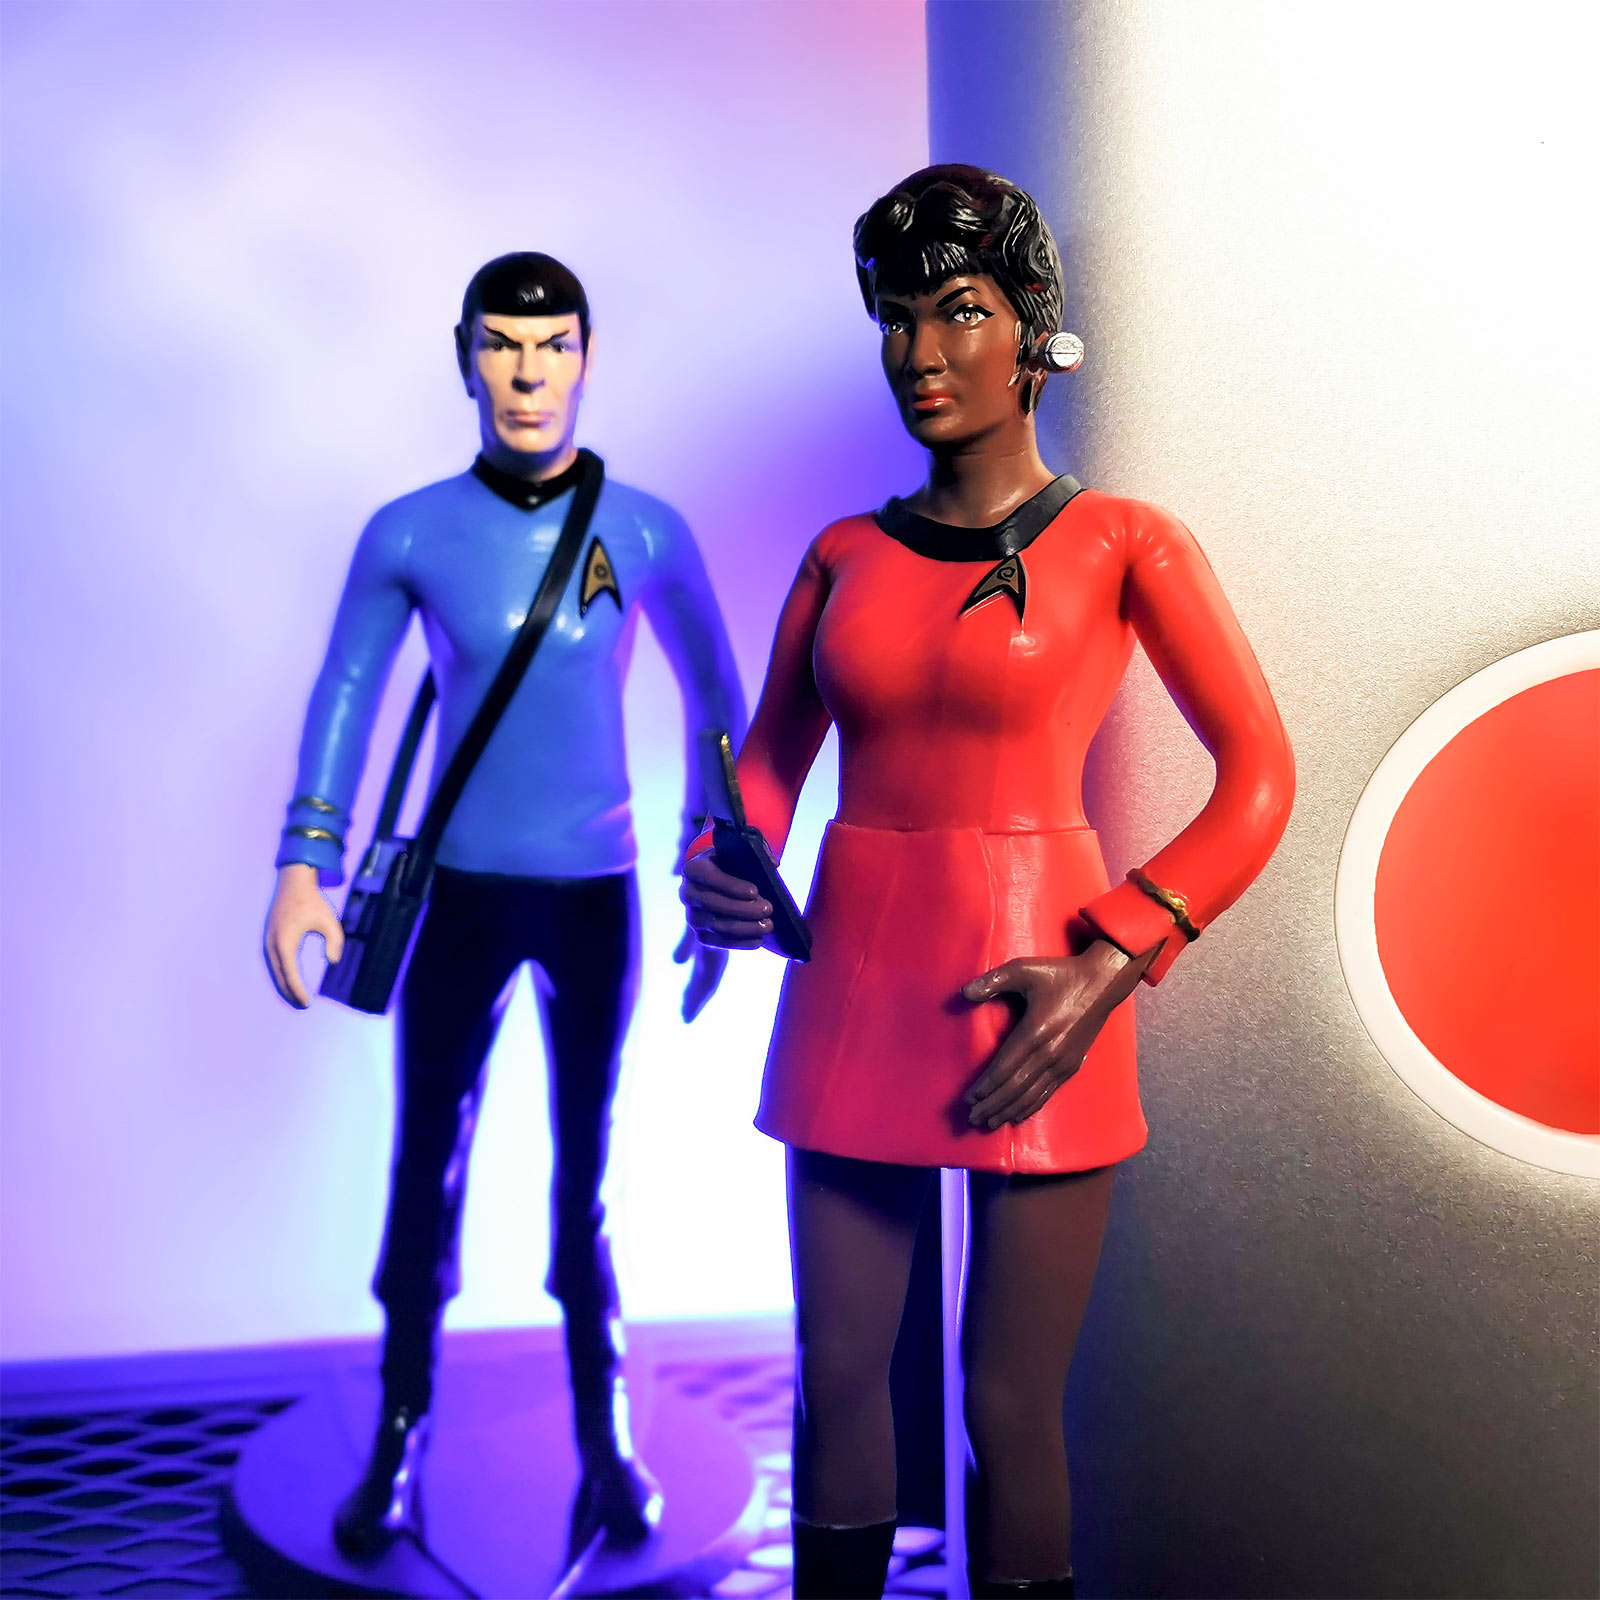 Star Trek - Uhura Bendyfigs Figur 18 cm